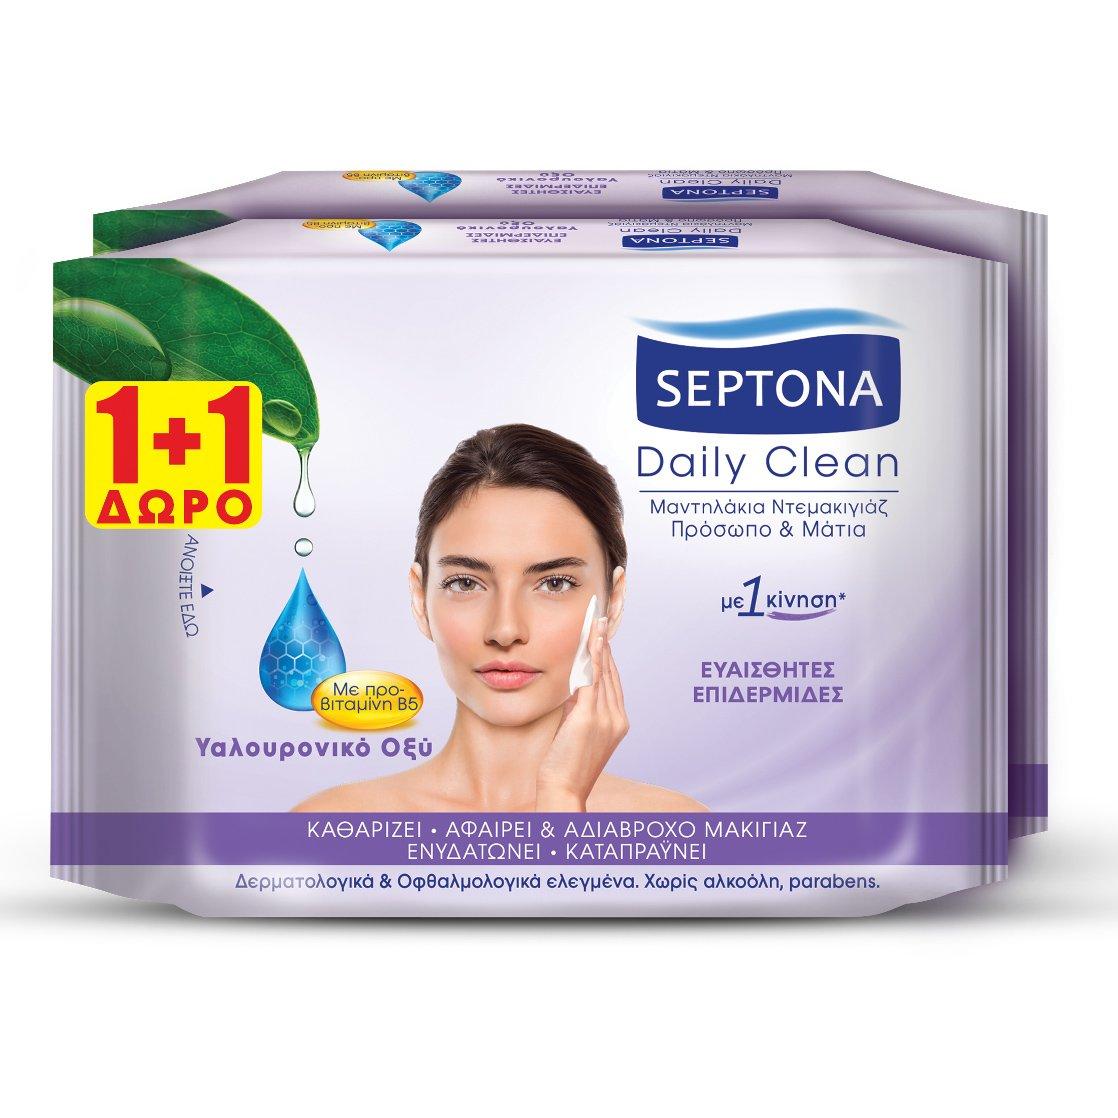 Septona Daily Clean Μαντηλάκια Ντεμακιγιάζ Προσώπου Ματιών με Υαλουρονικό Οξύ για Ευαίσθητες Επιδερμίδας 2×20 Wipes 1+1 Δώρο